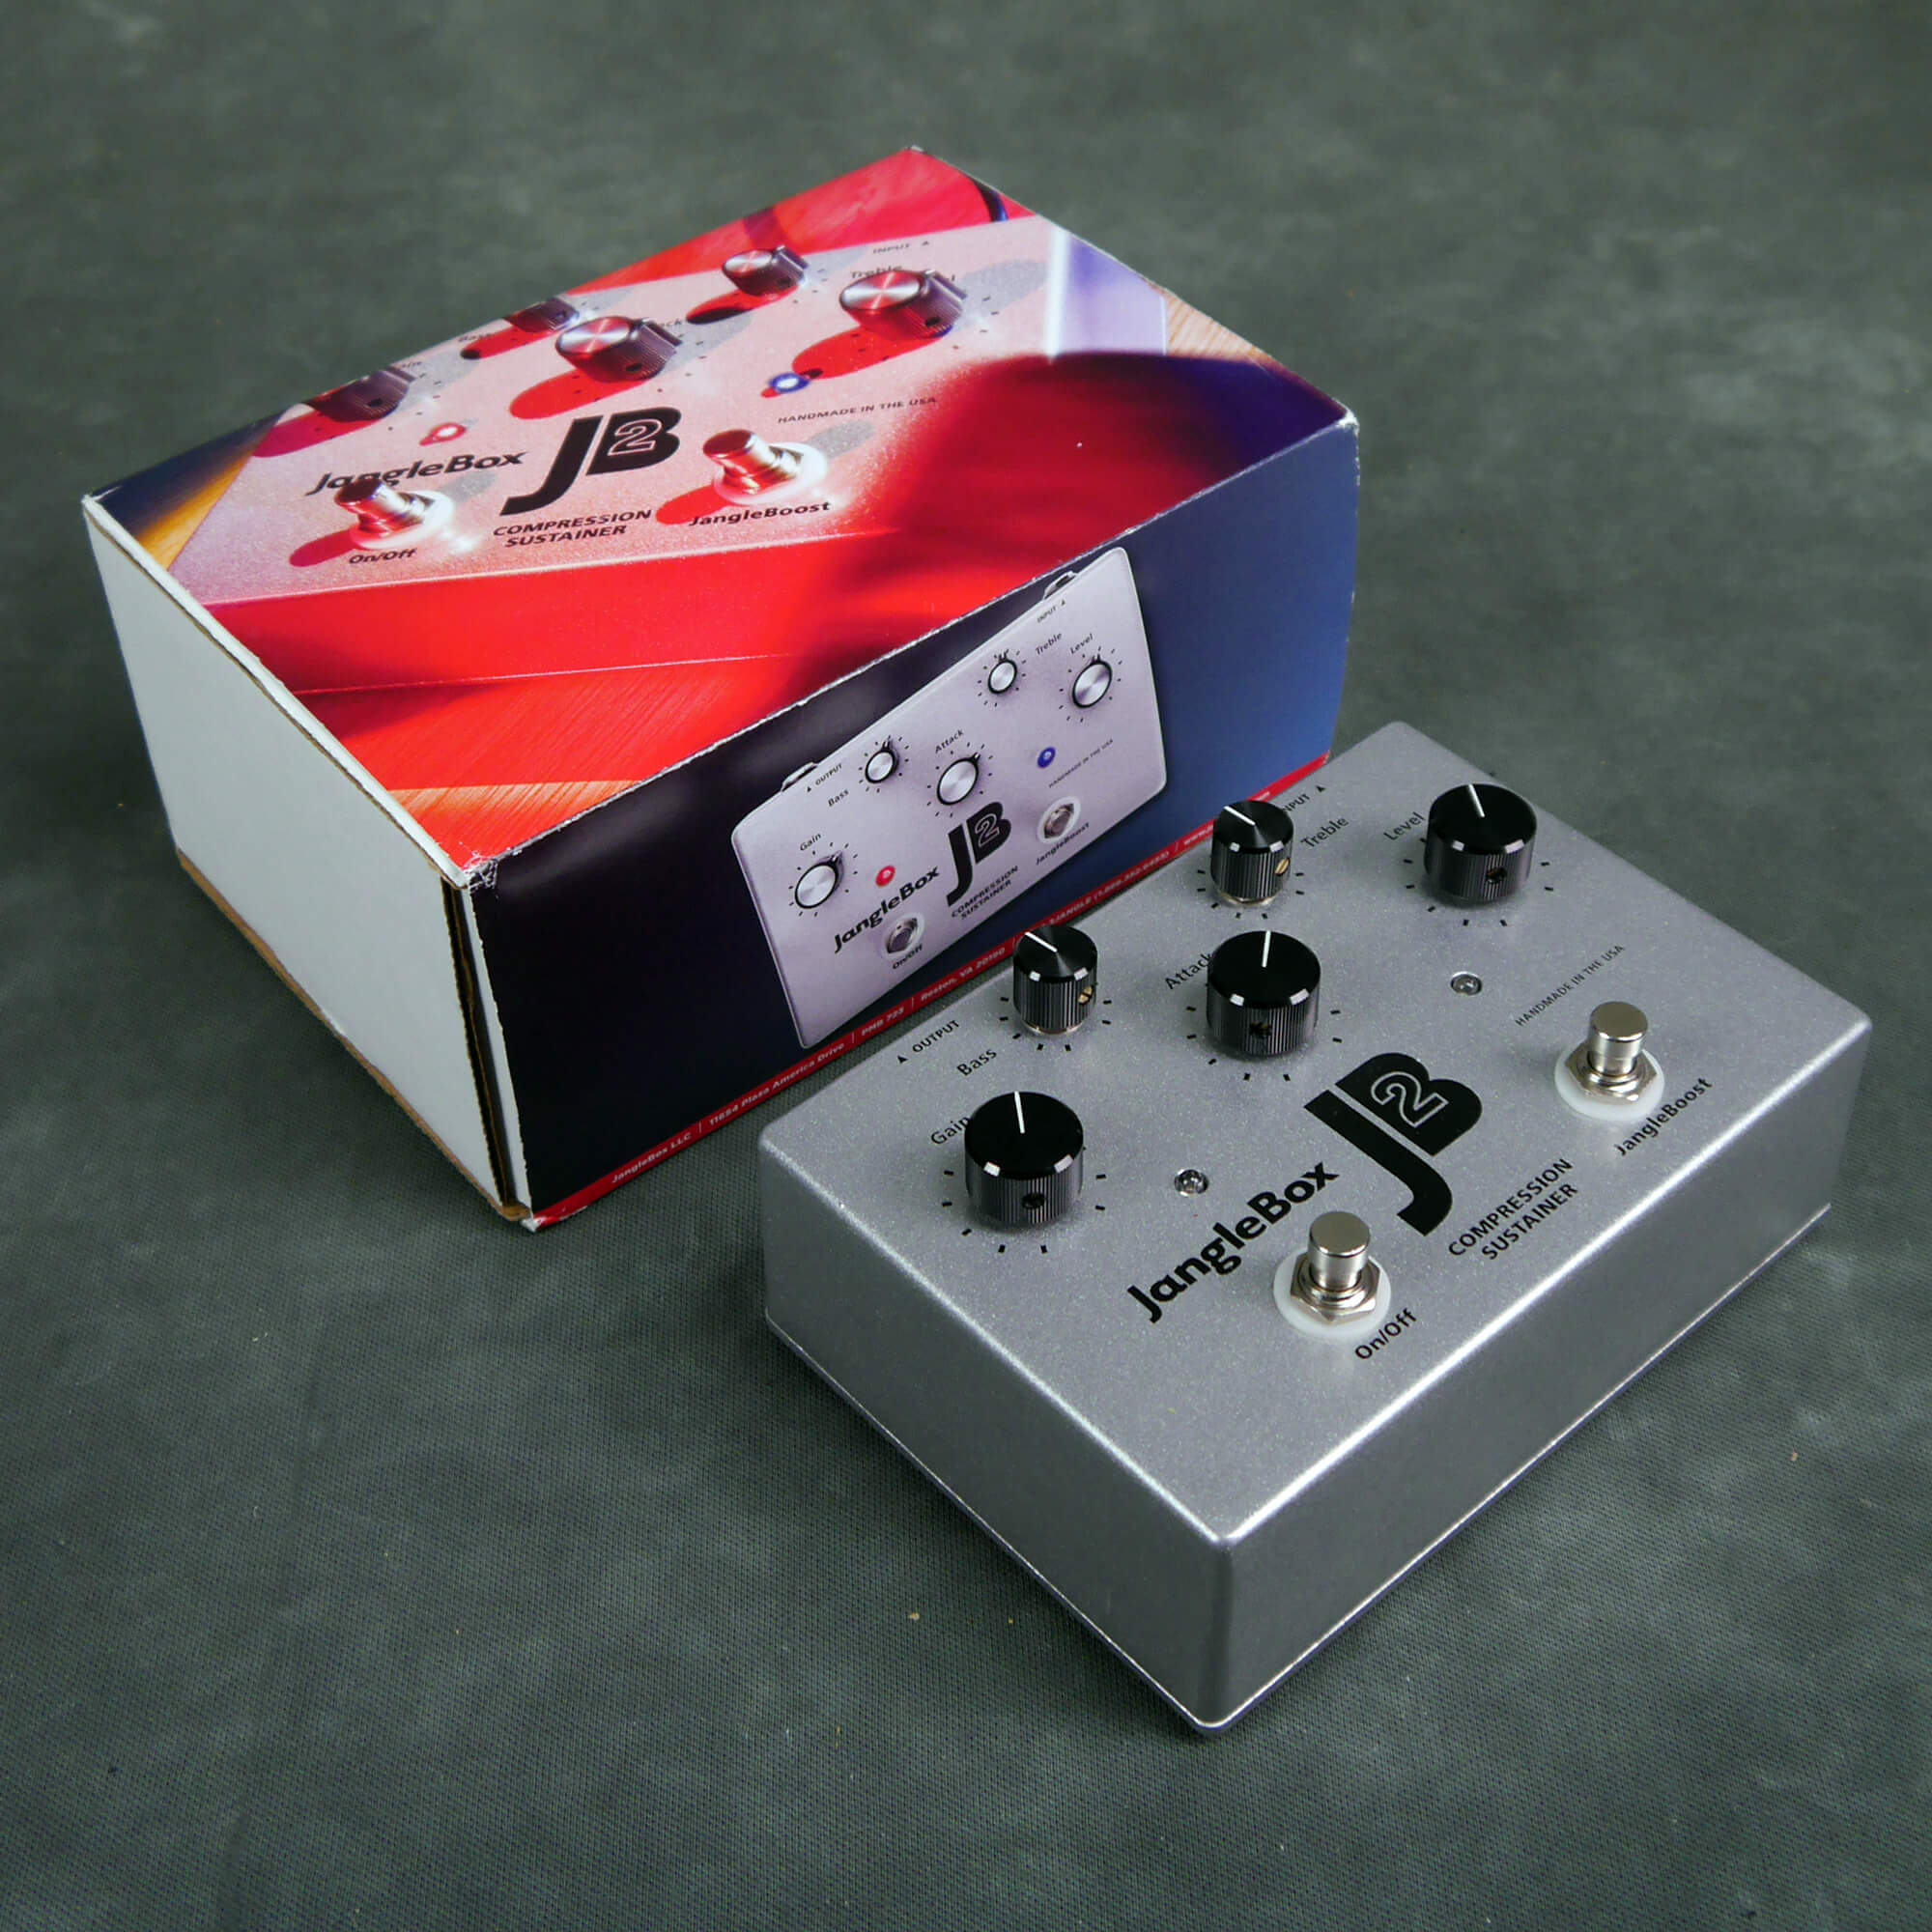 JangleBox JB2 Compression Sustainer FX Pedal w/Box - 2nd Hand